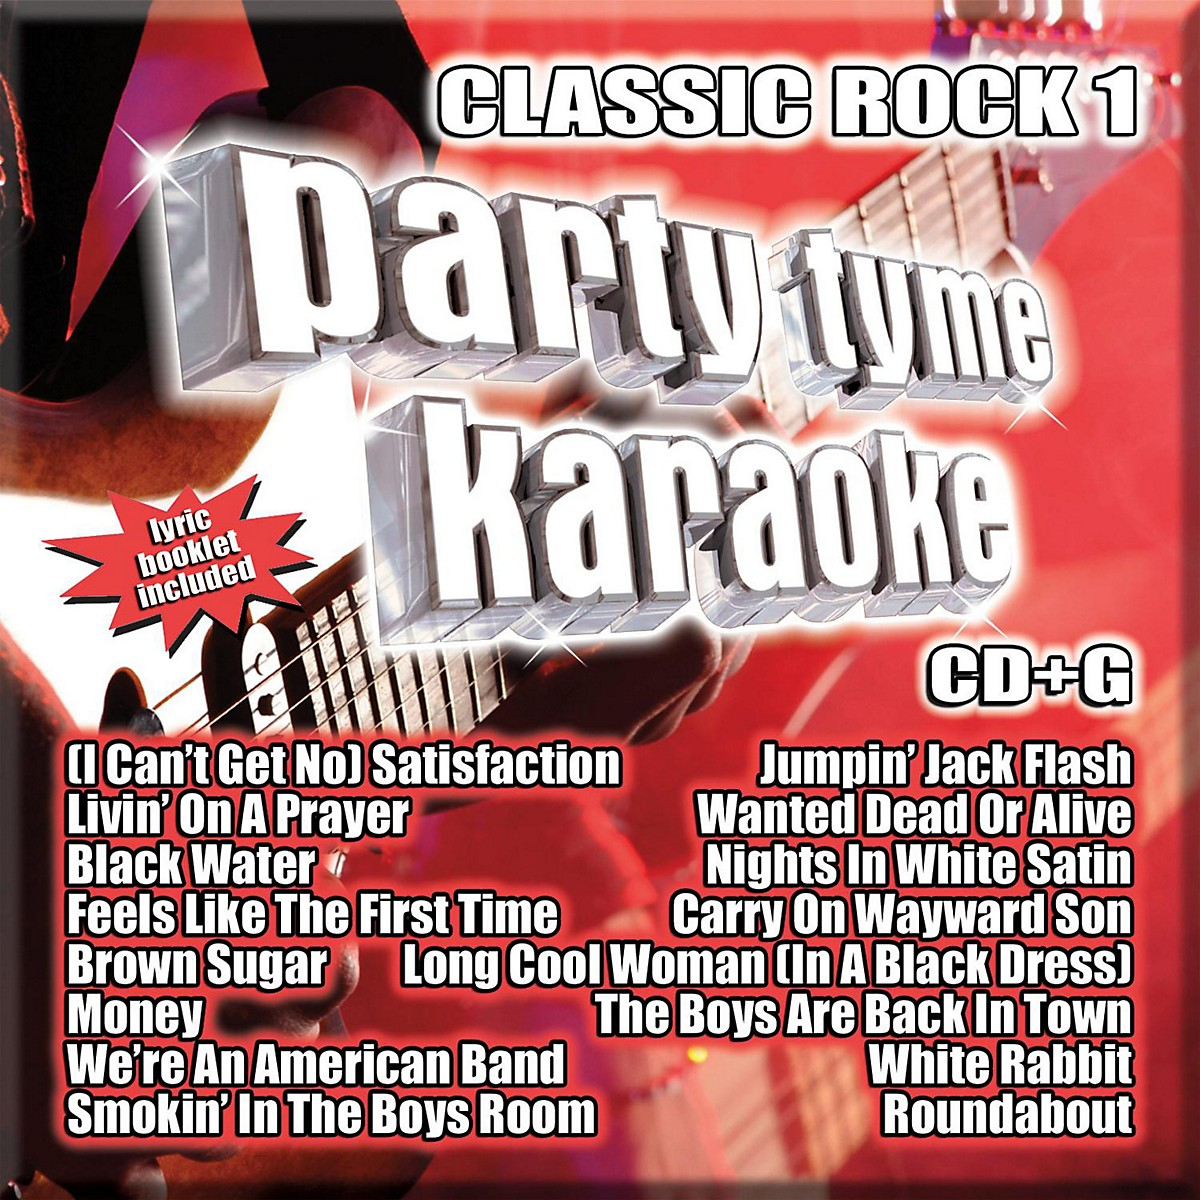 Sybersound Party Tyme Karaoke - Classic Rock 1